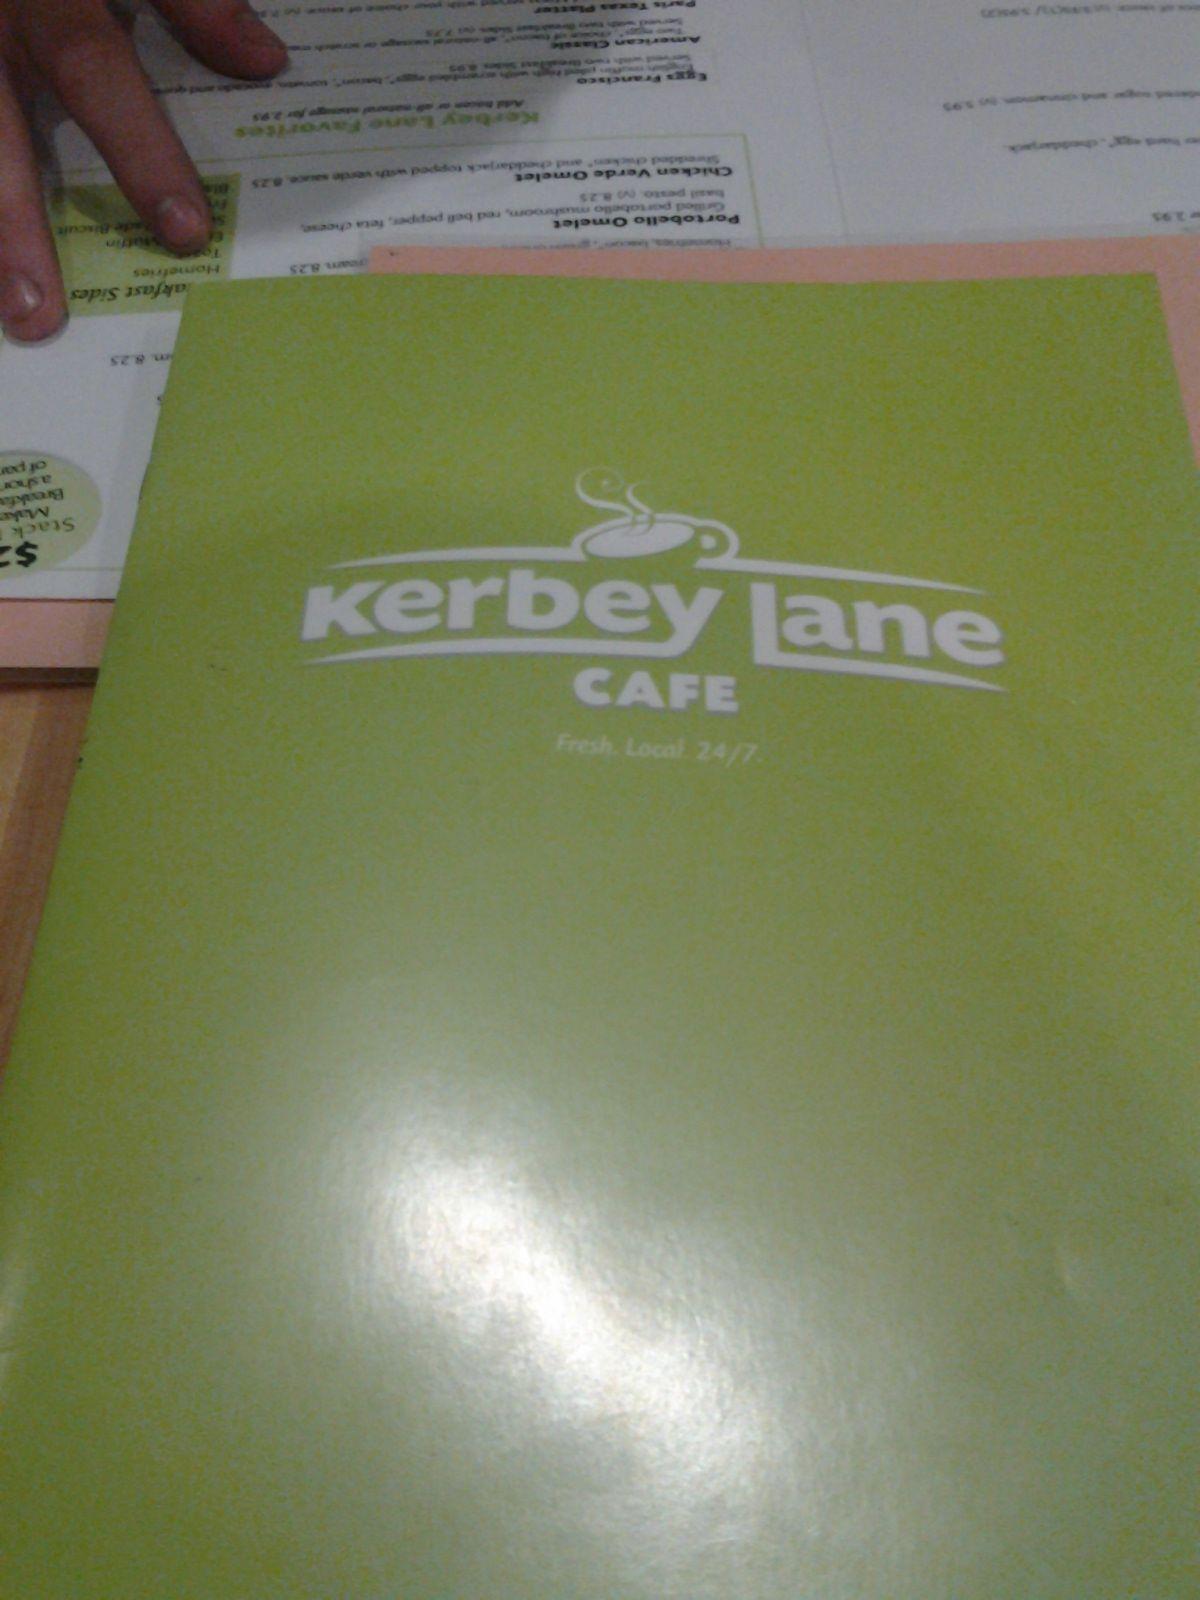 Kerby Lane menu!